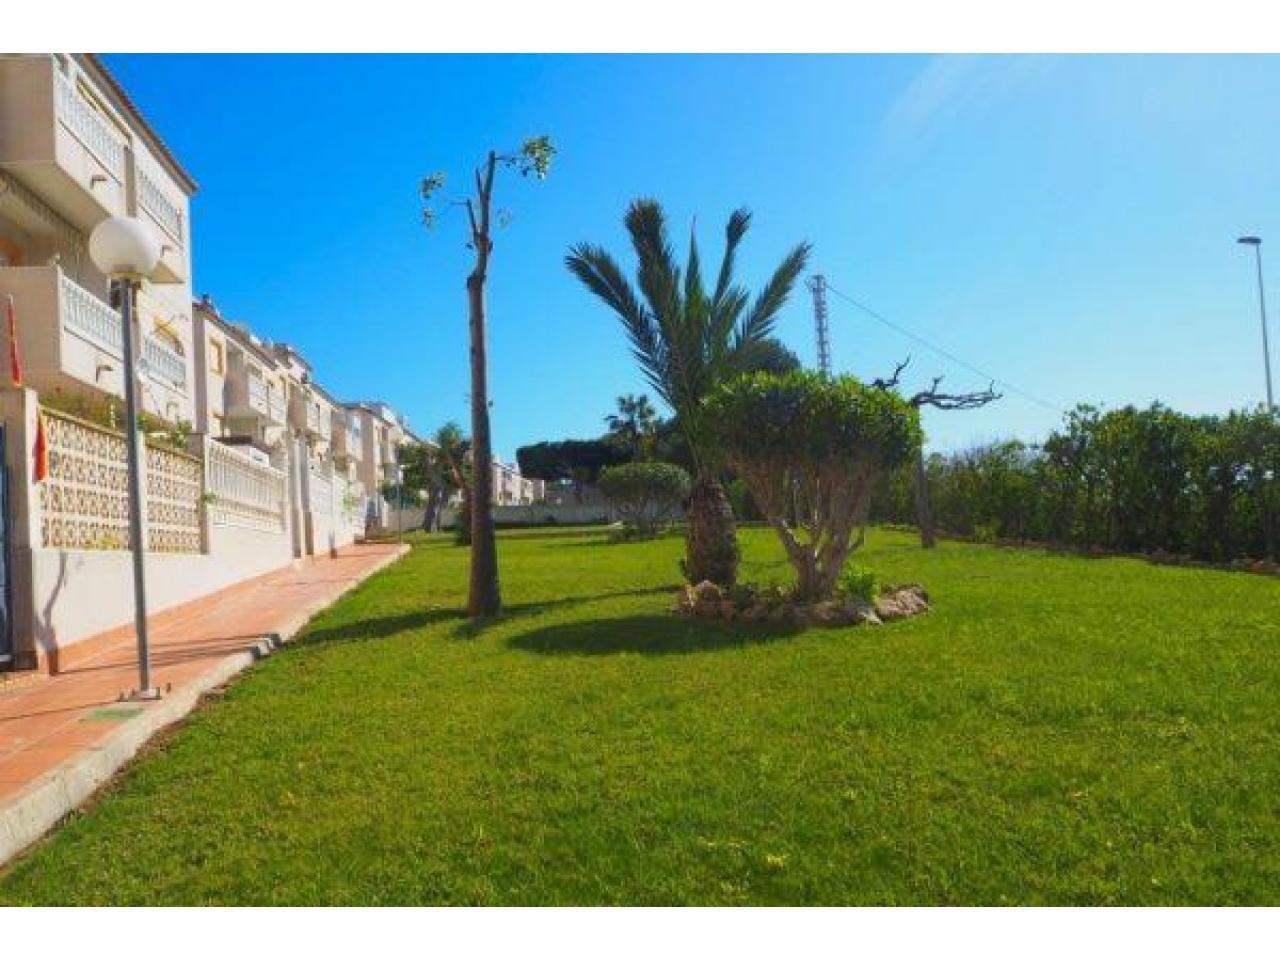 Недвижимость в Испании, Квартира c видами на море в Торревьеха,Коста Бланка,Испания - 9